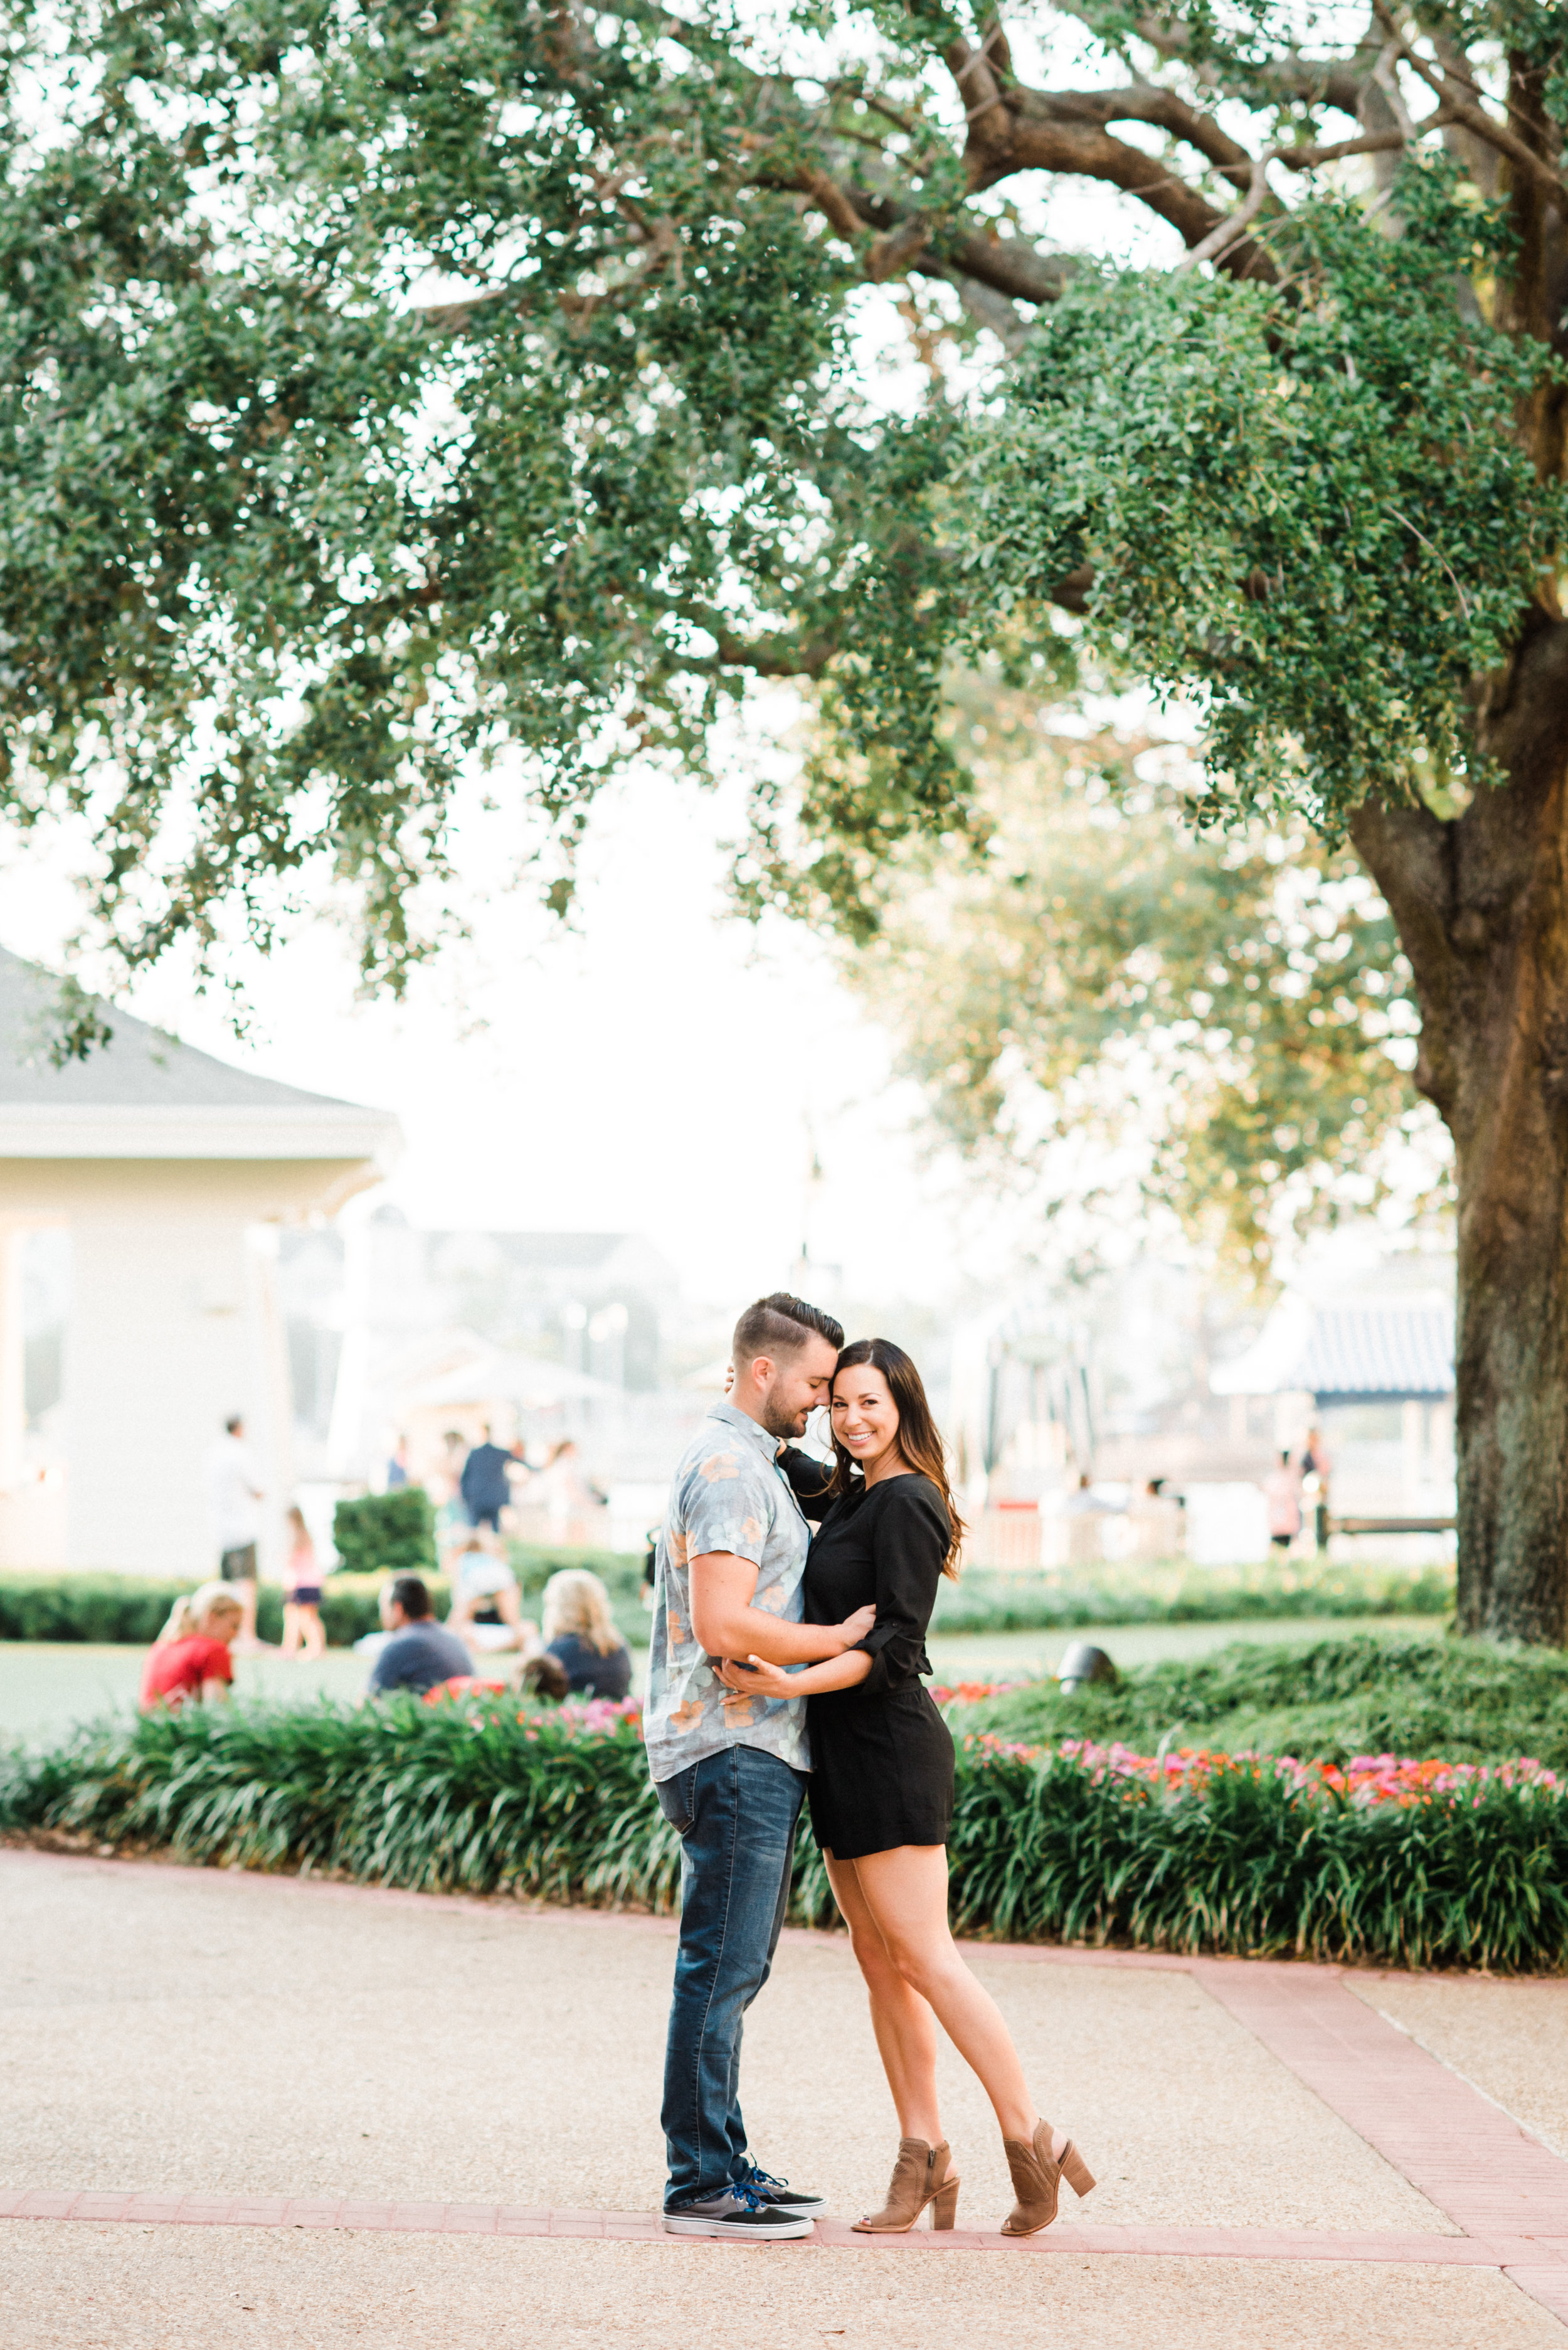 KateTaramykinStudios-Disney-Boardwalk-Couples-Portraits-KatMarc-17.jpg